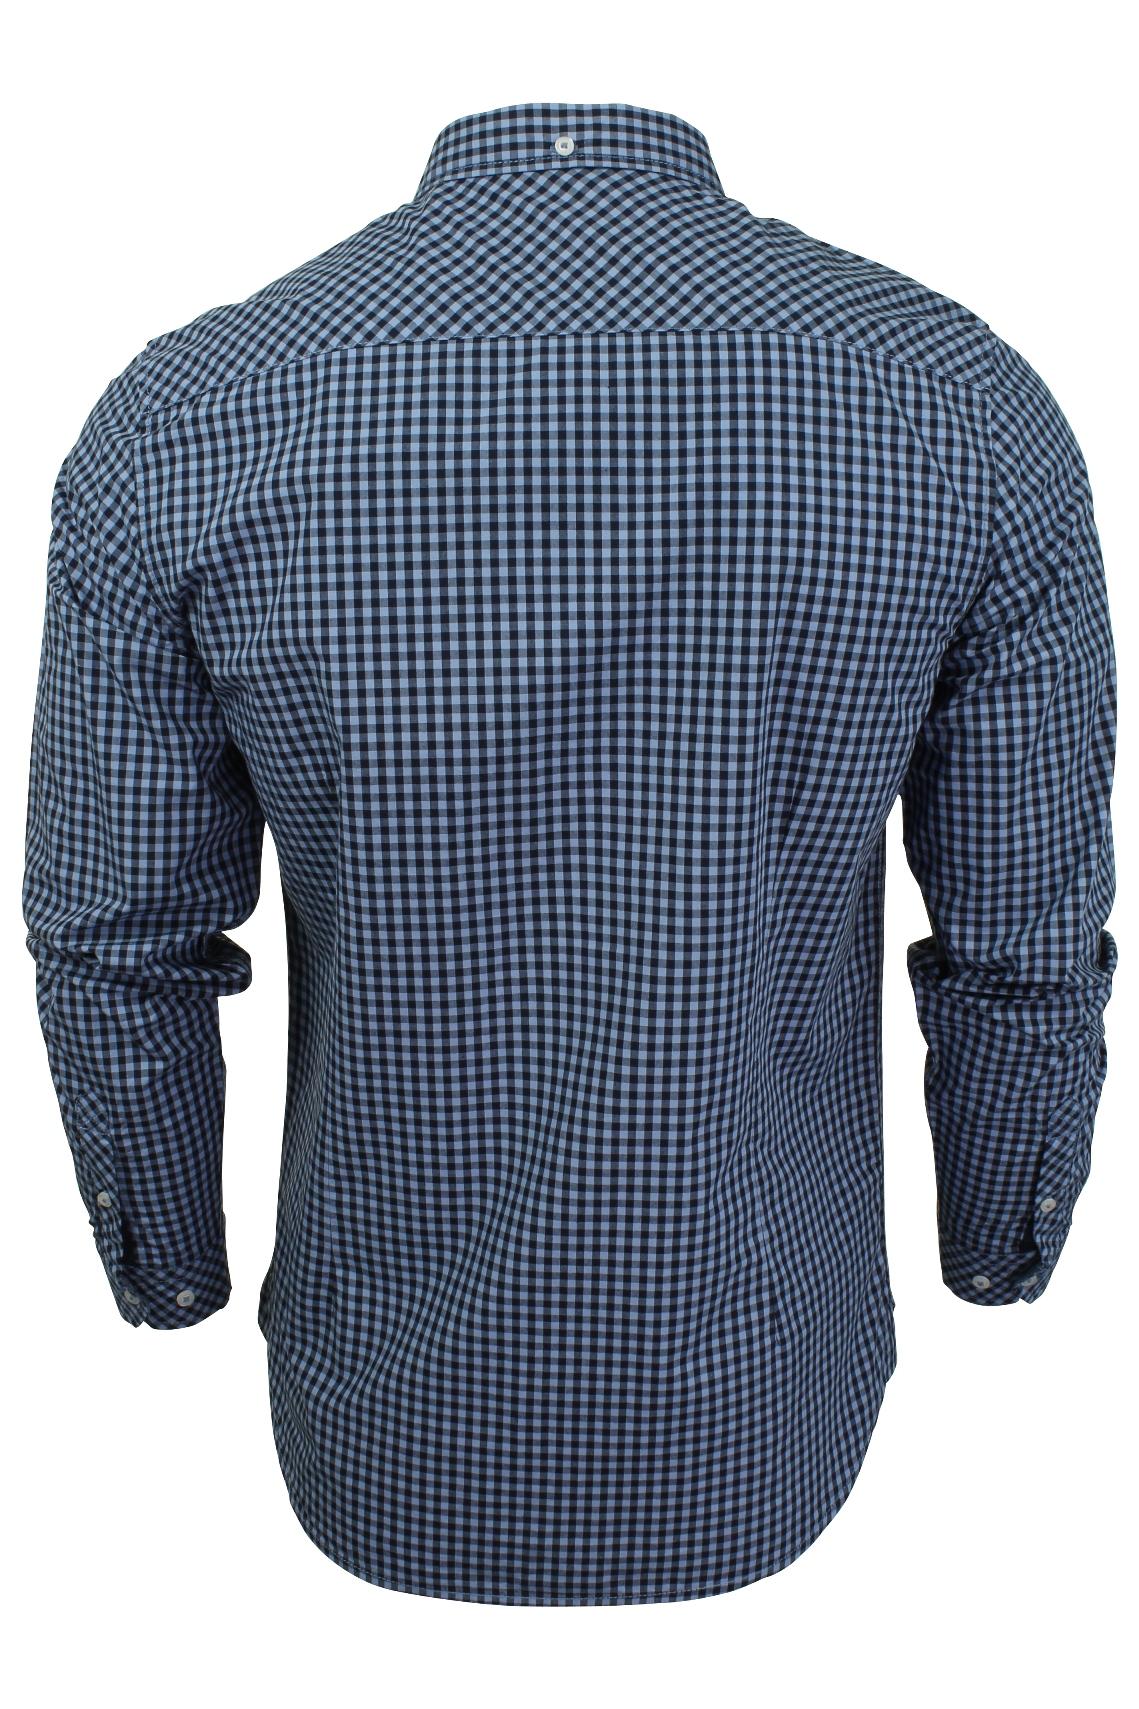 Mens-Gingham-Check-Shirt-by-Tokyo-Laundry-039-Newick-039-Long-Sleeved thumbnail 8